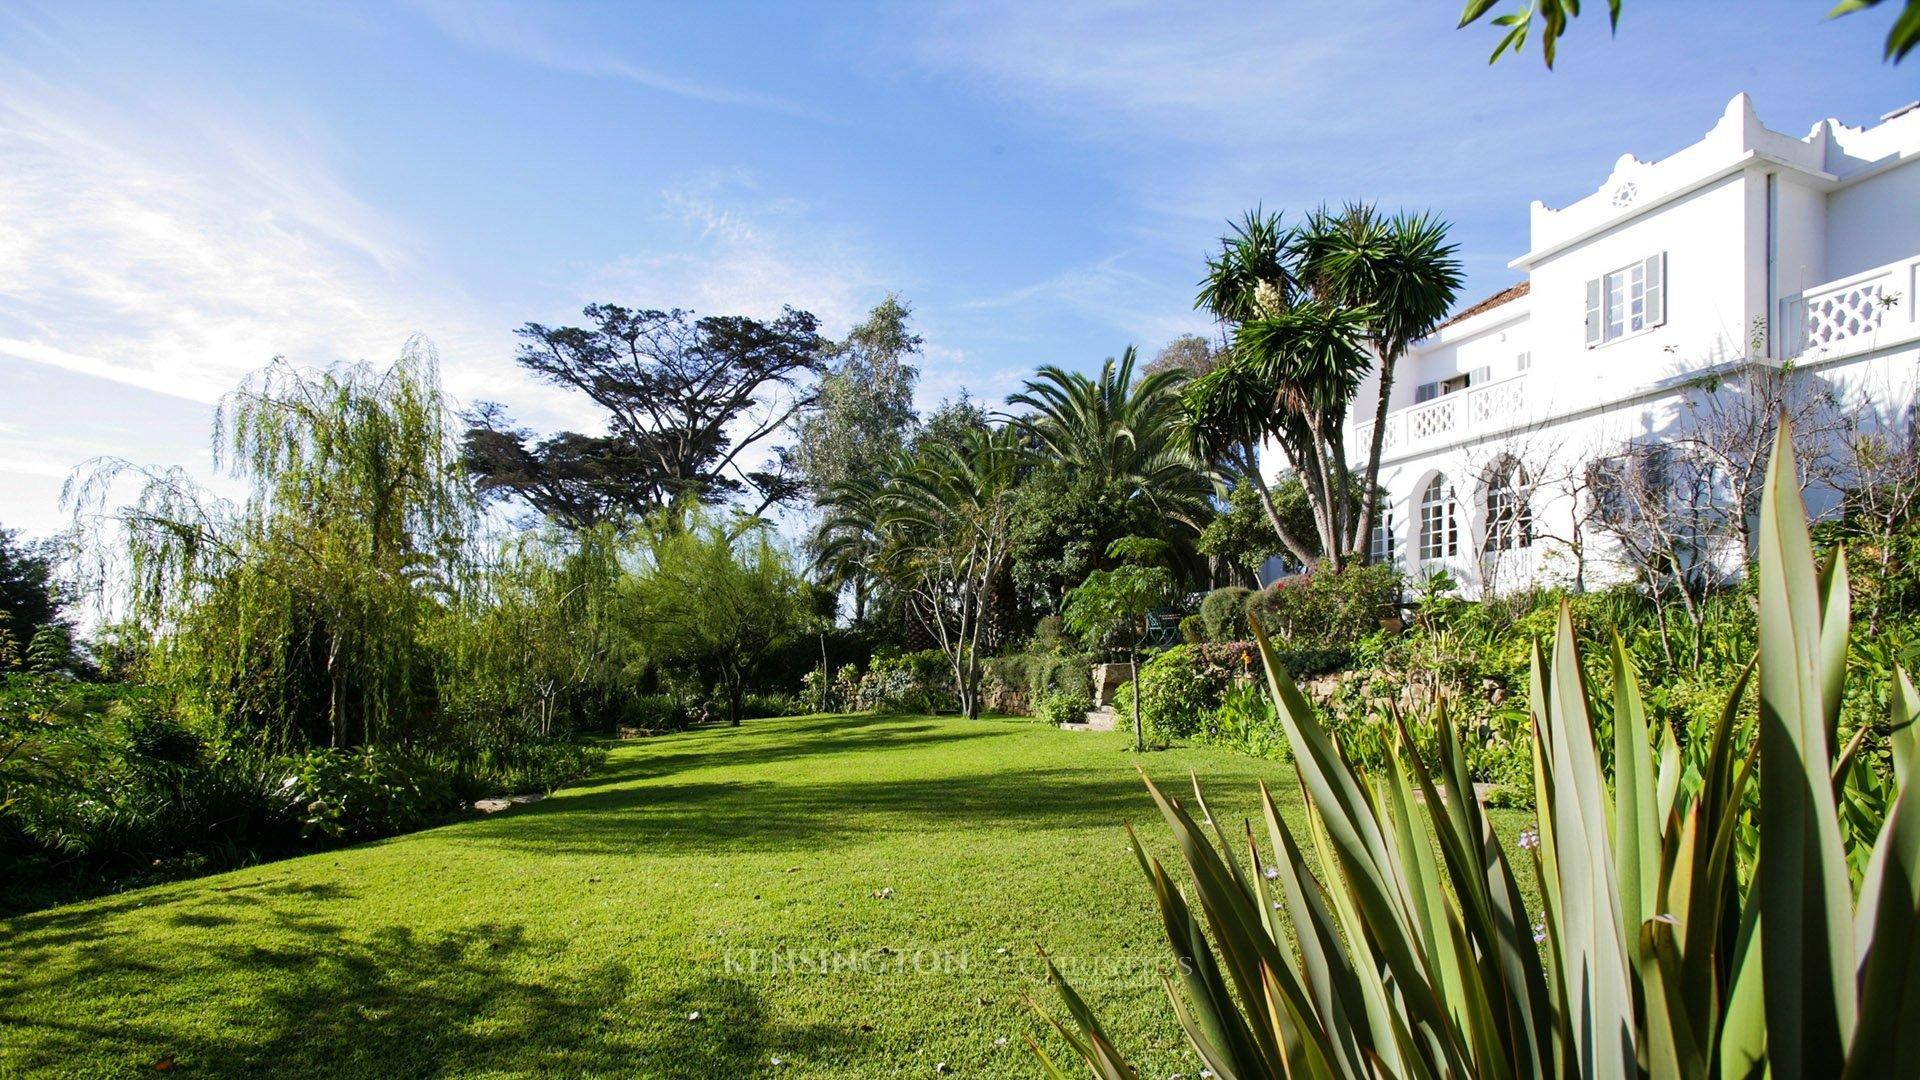 KPPM00794: Villa Suhail Luxury Villa Tanger Morocco